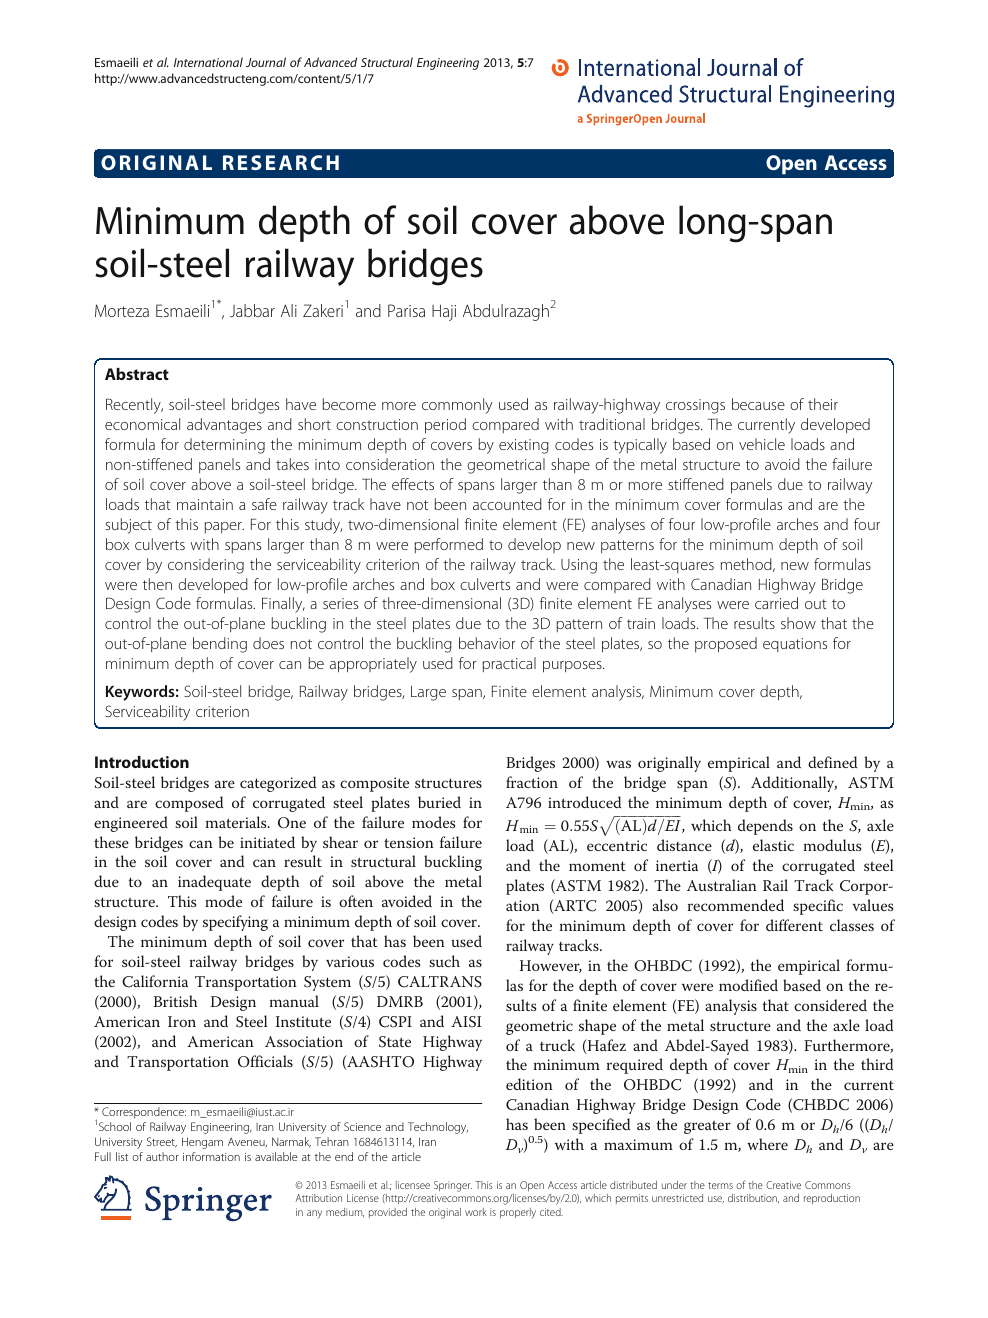 Minimum depth of soil cover above long-span soil-steel